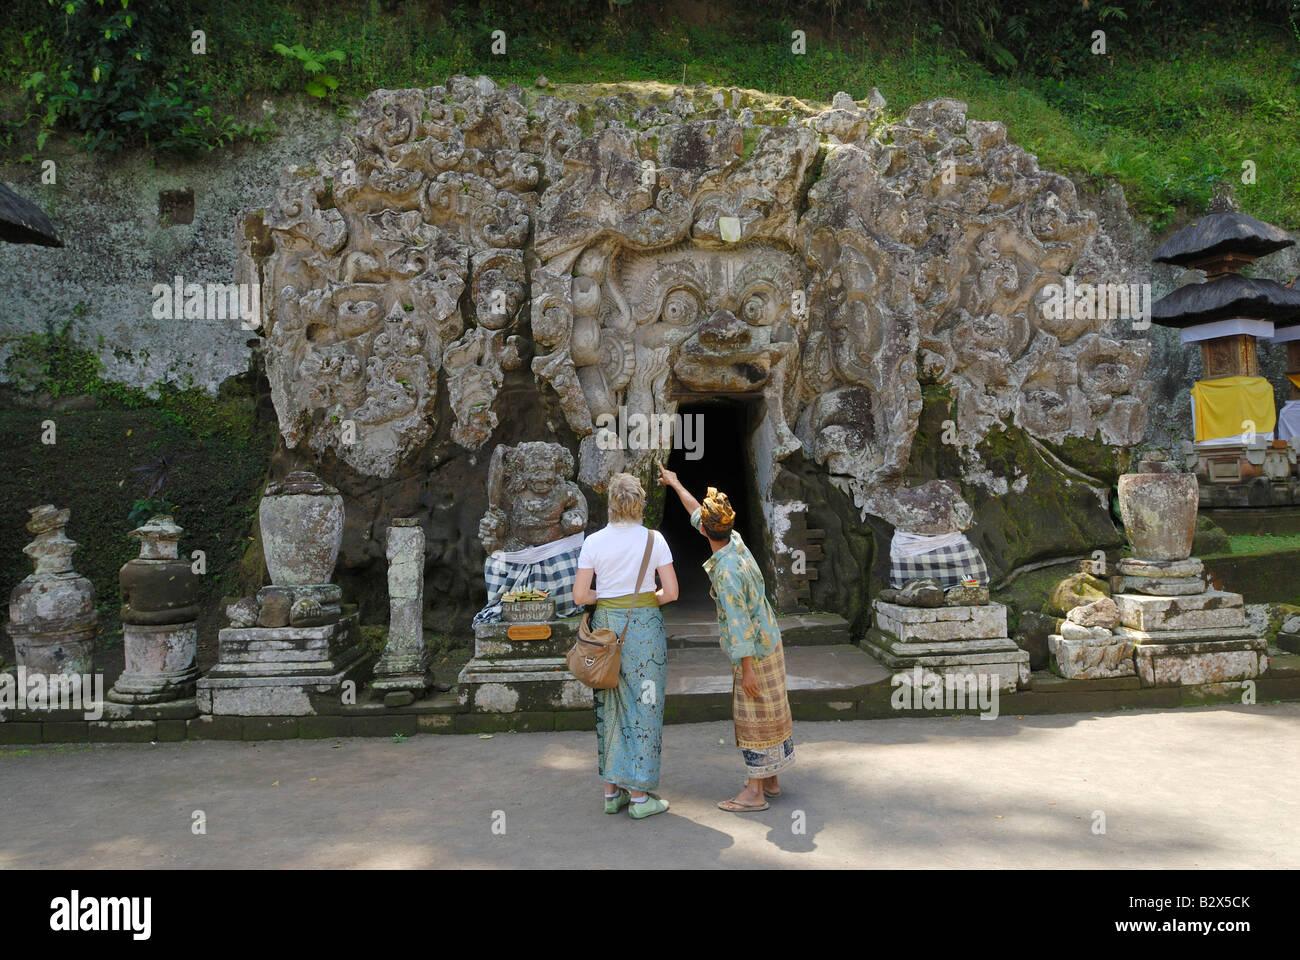 ELEFANTENHÖHLE Goa Gajah, Touristen vor, Bali, Indonesien, Asien Stockbild